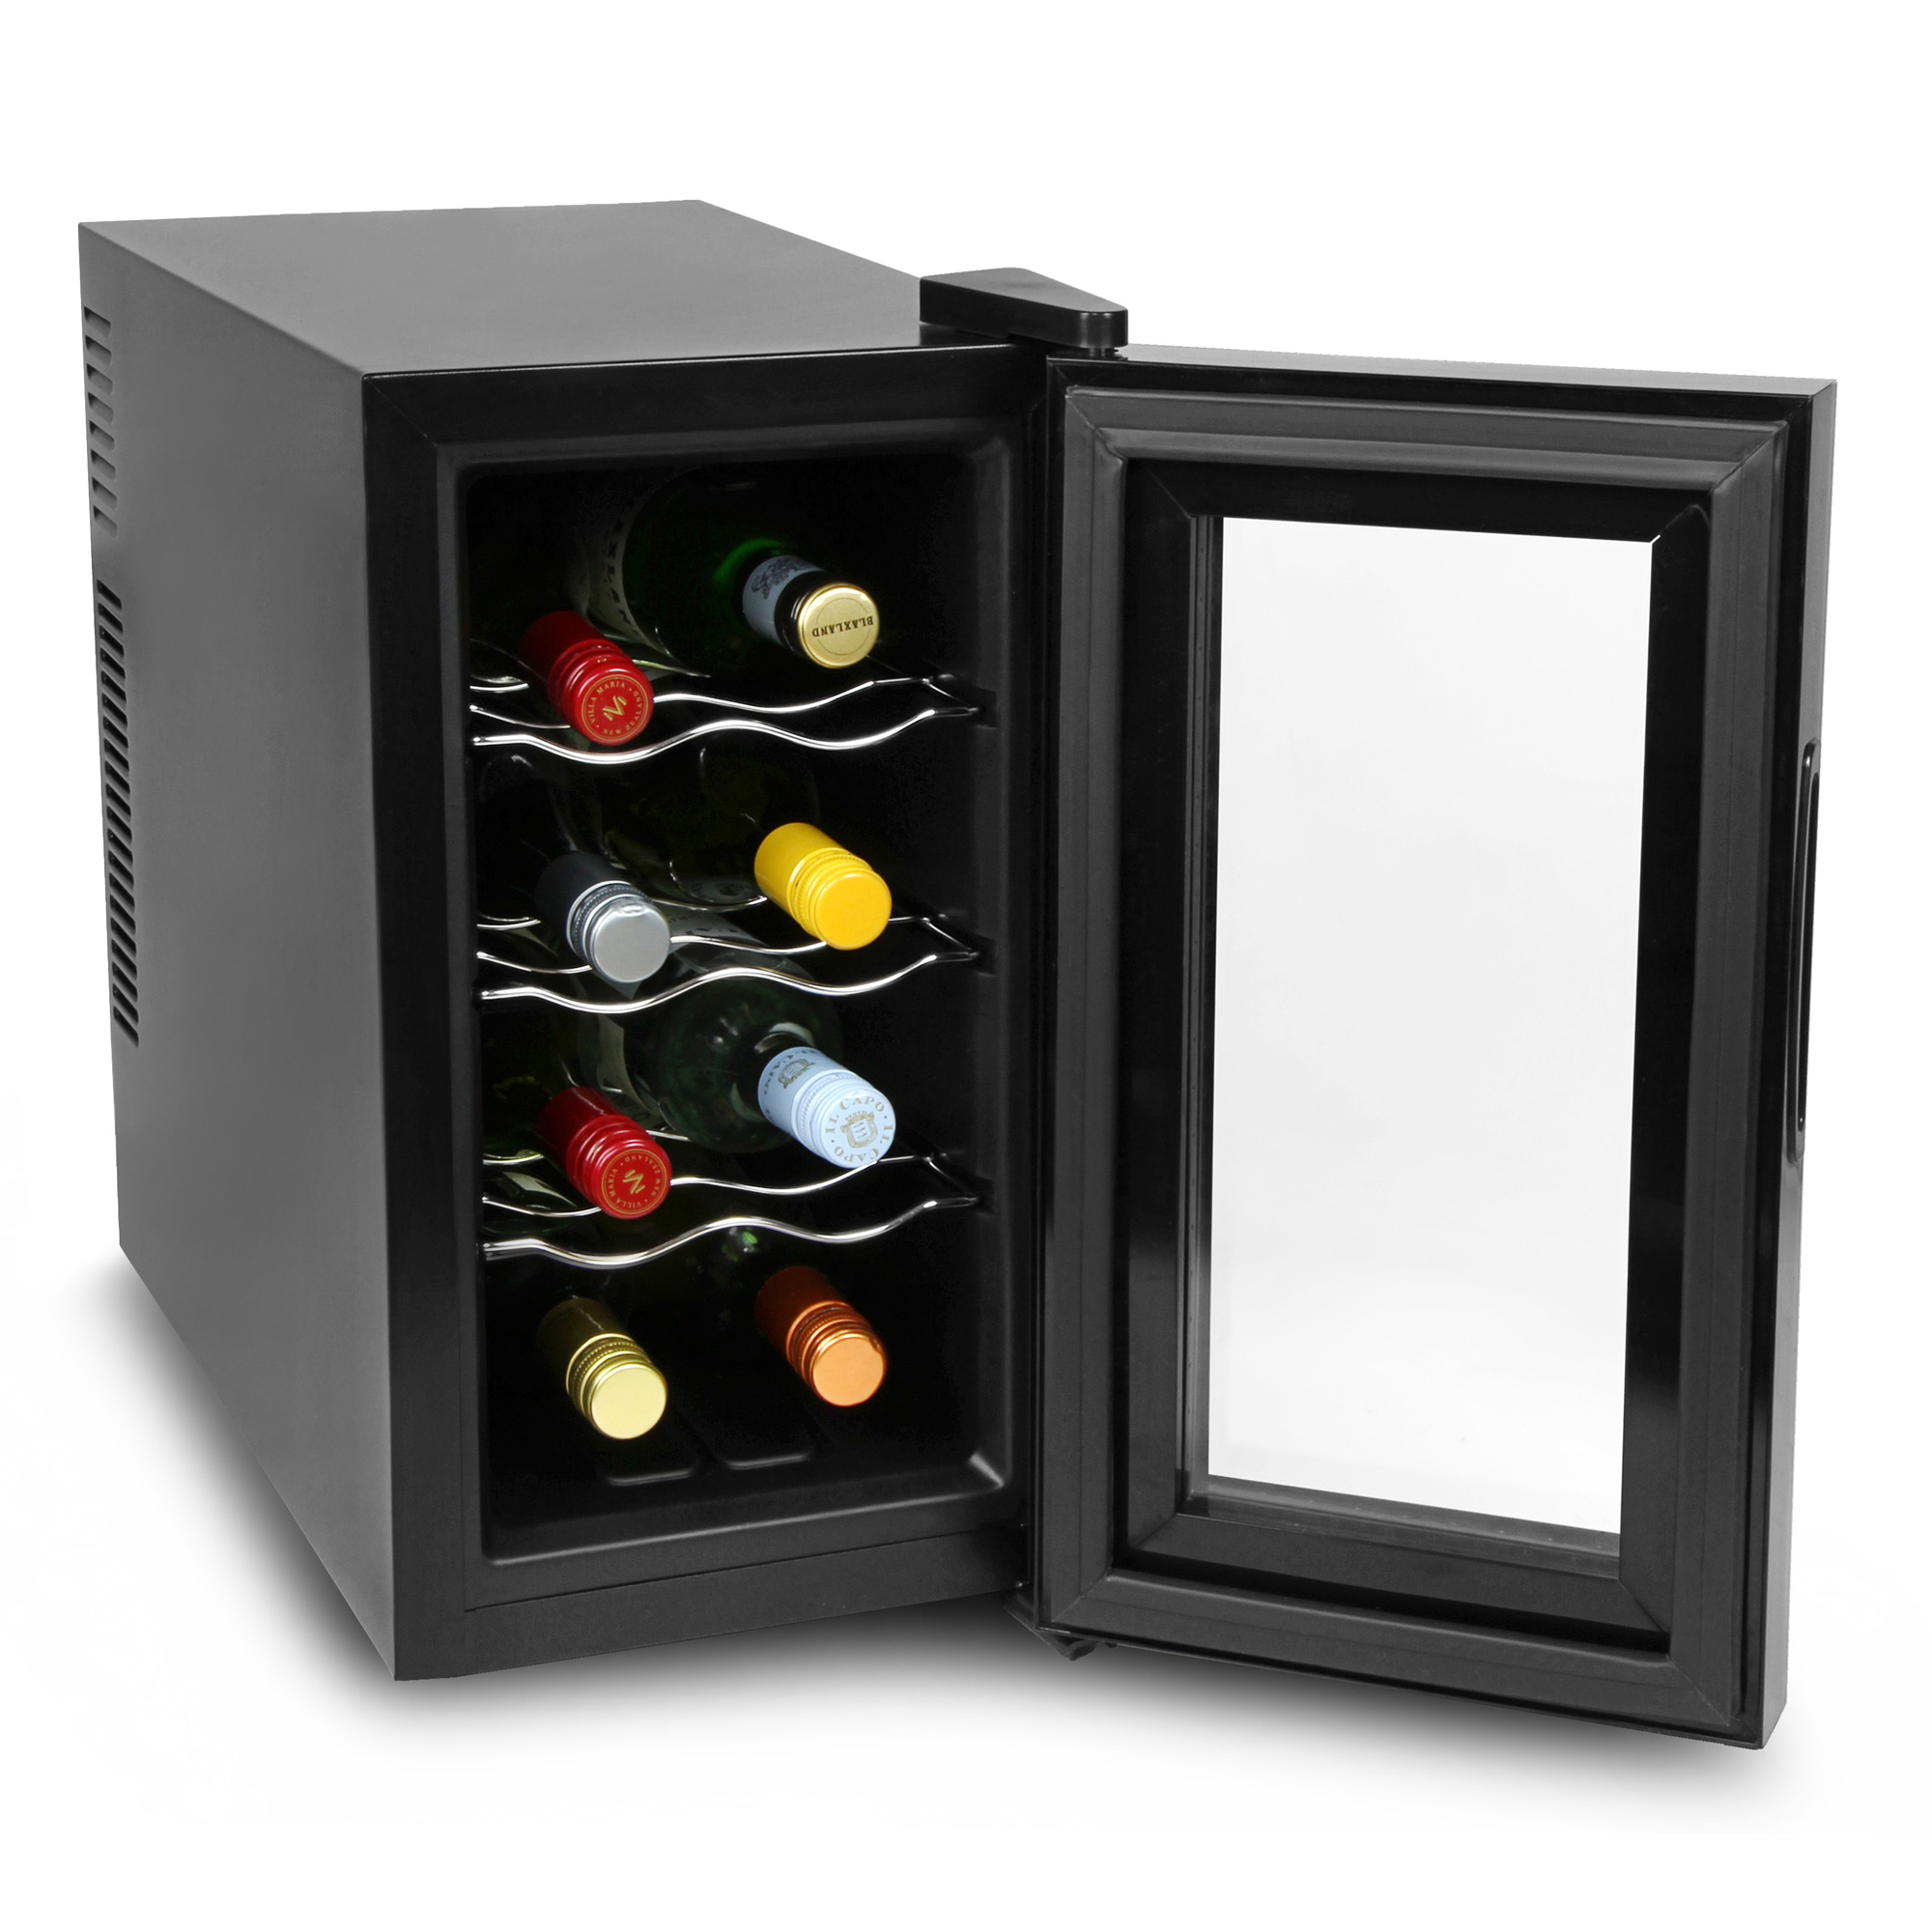 Vinotech 8 Bottle Wine Cellar Bottle Cooler At Drinkstuff